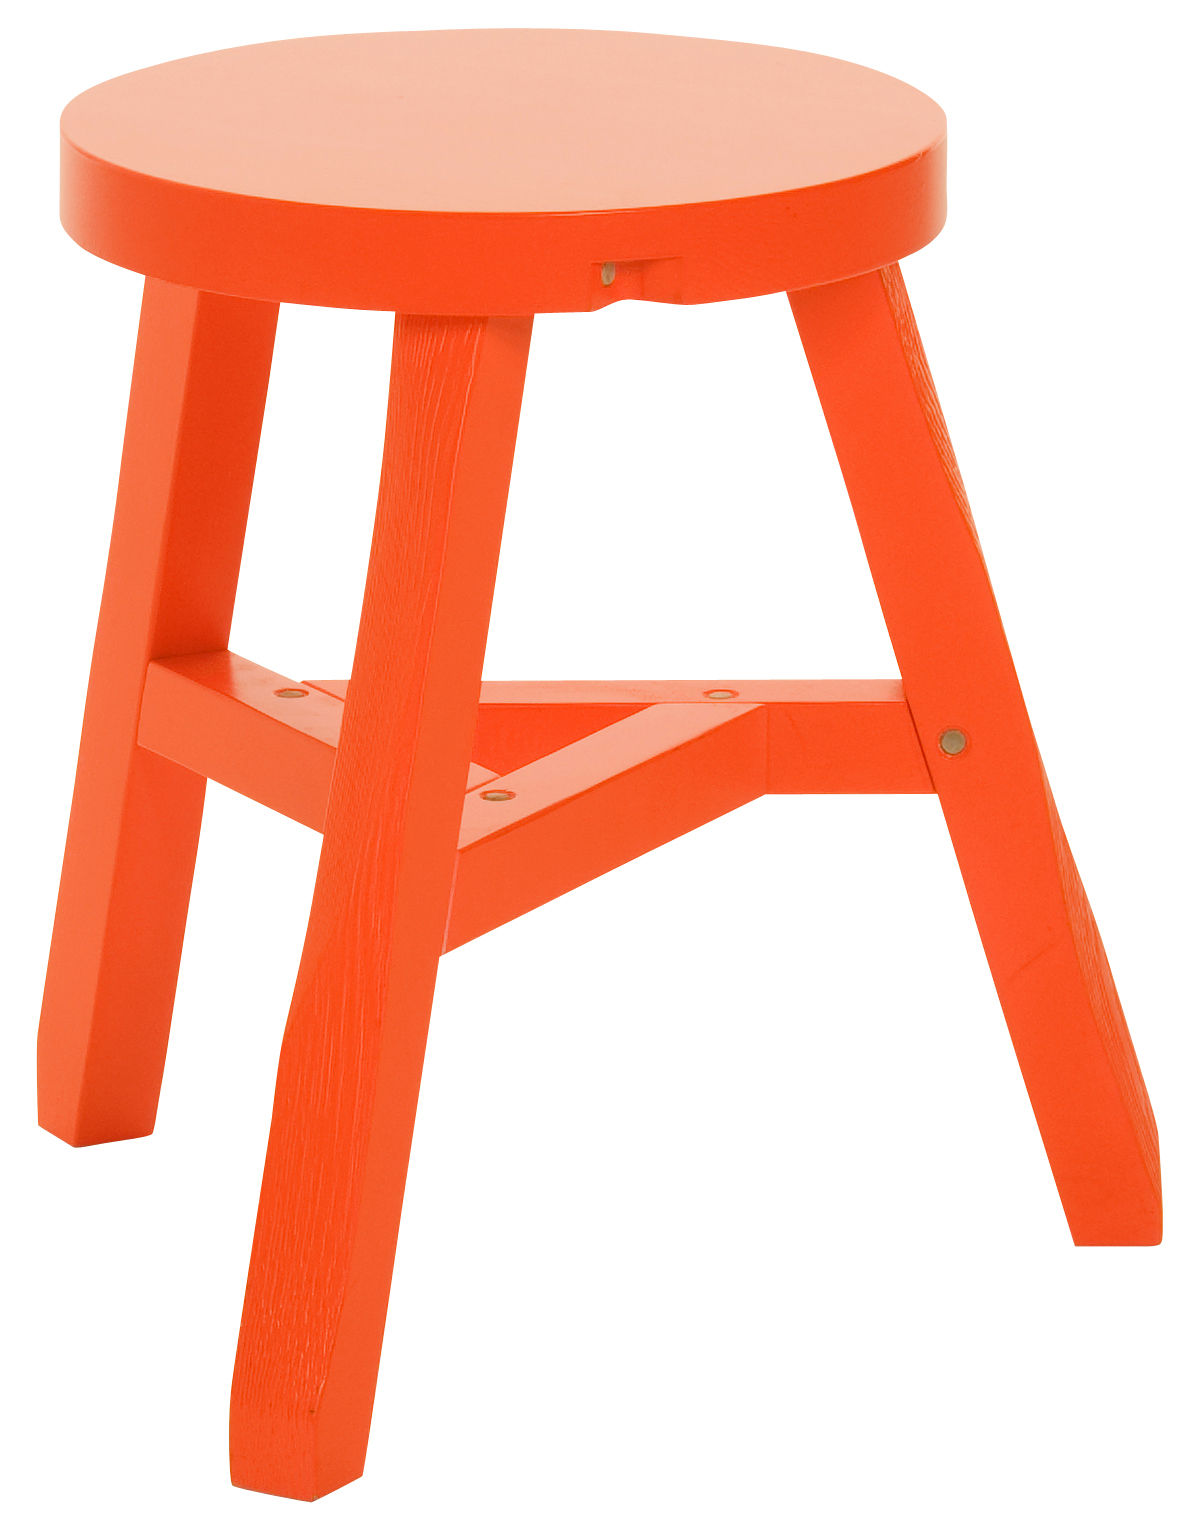 Offcut Stool Fluoro Orange By Tom Dixon